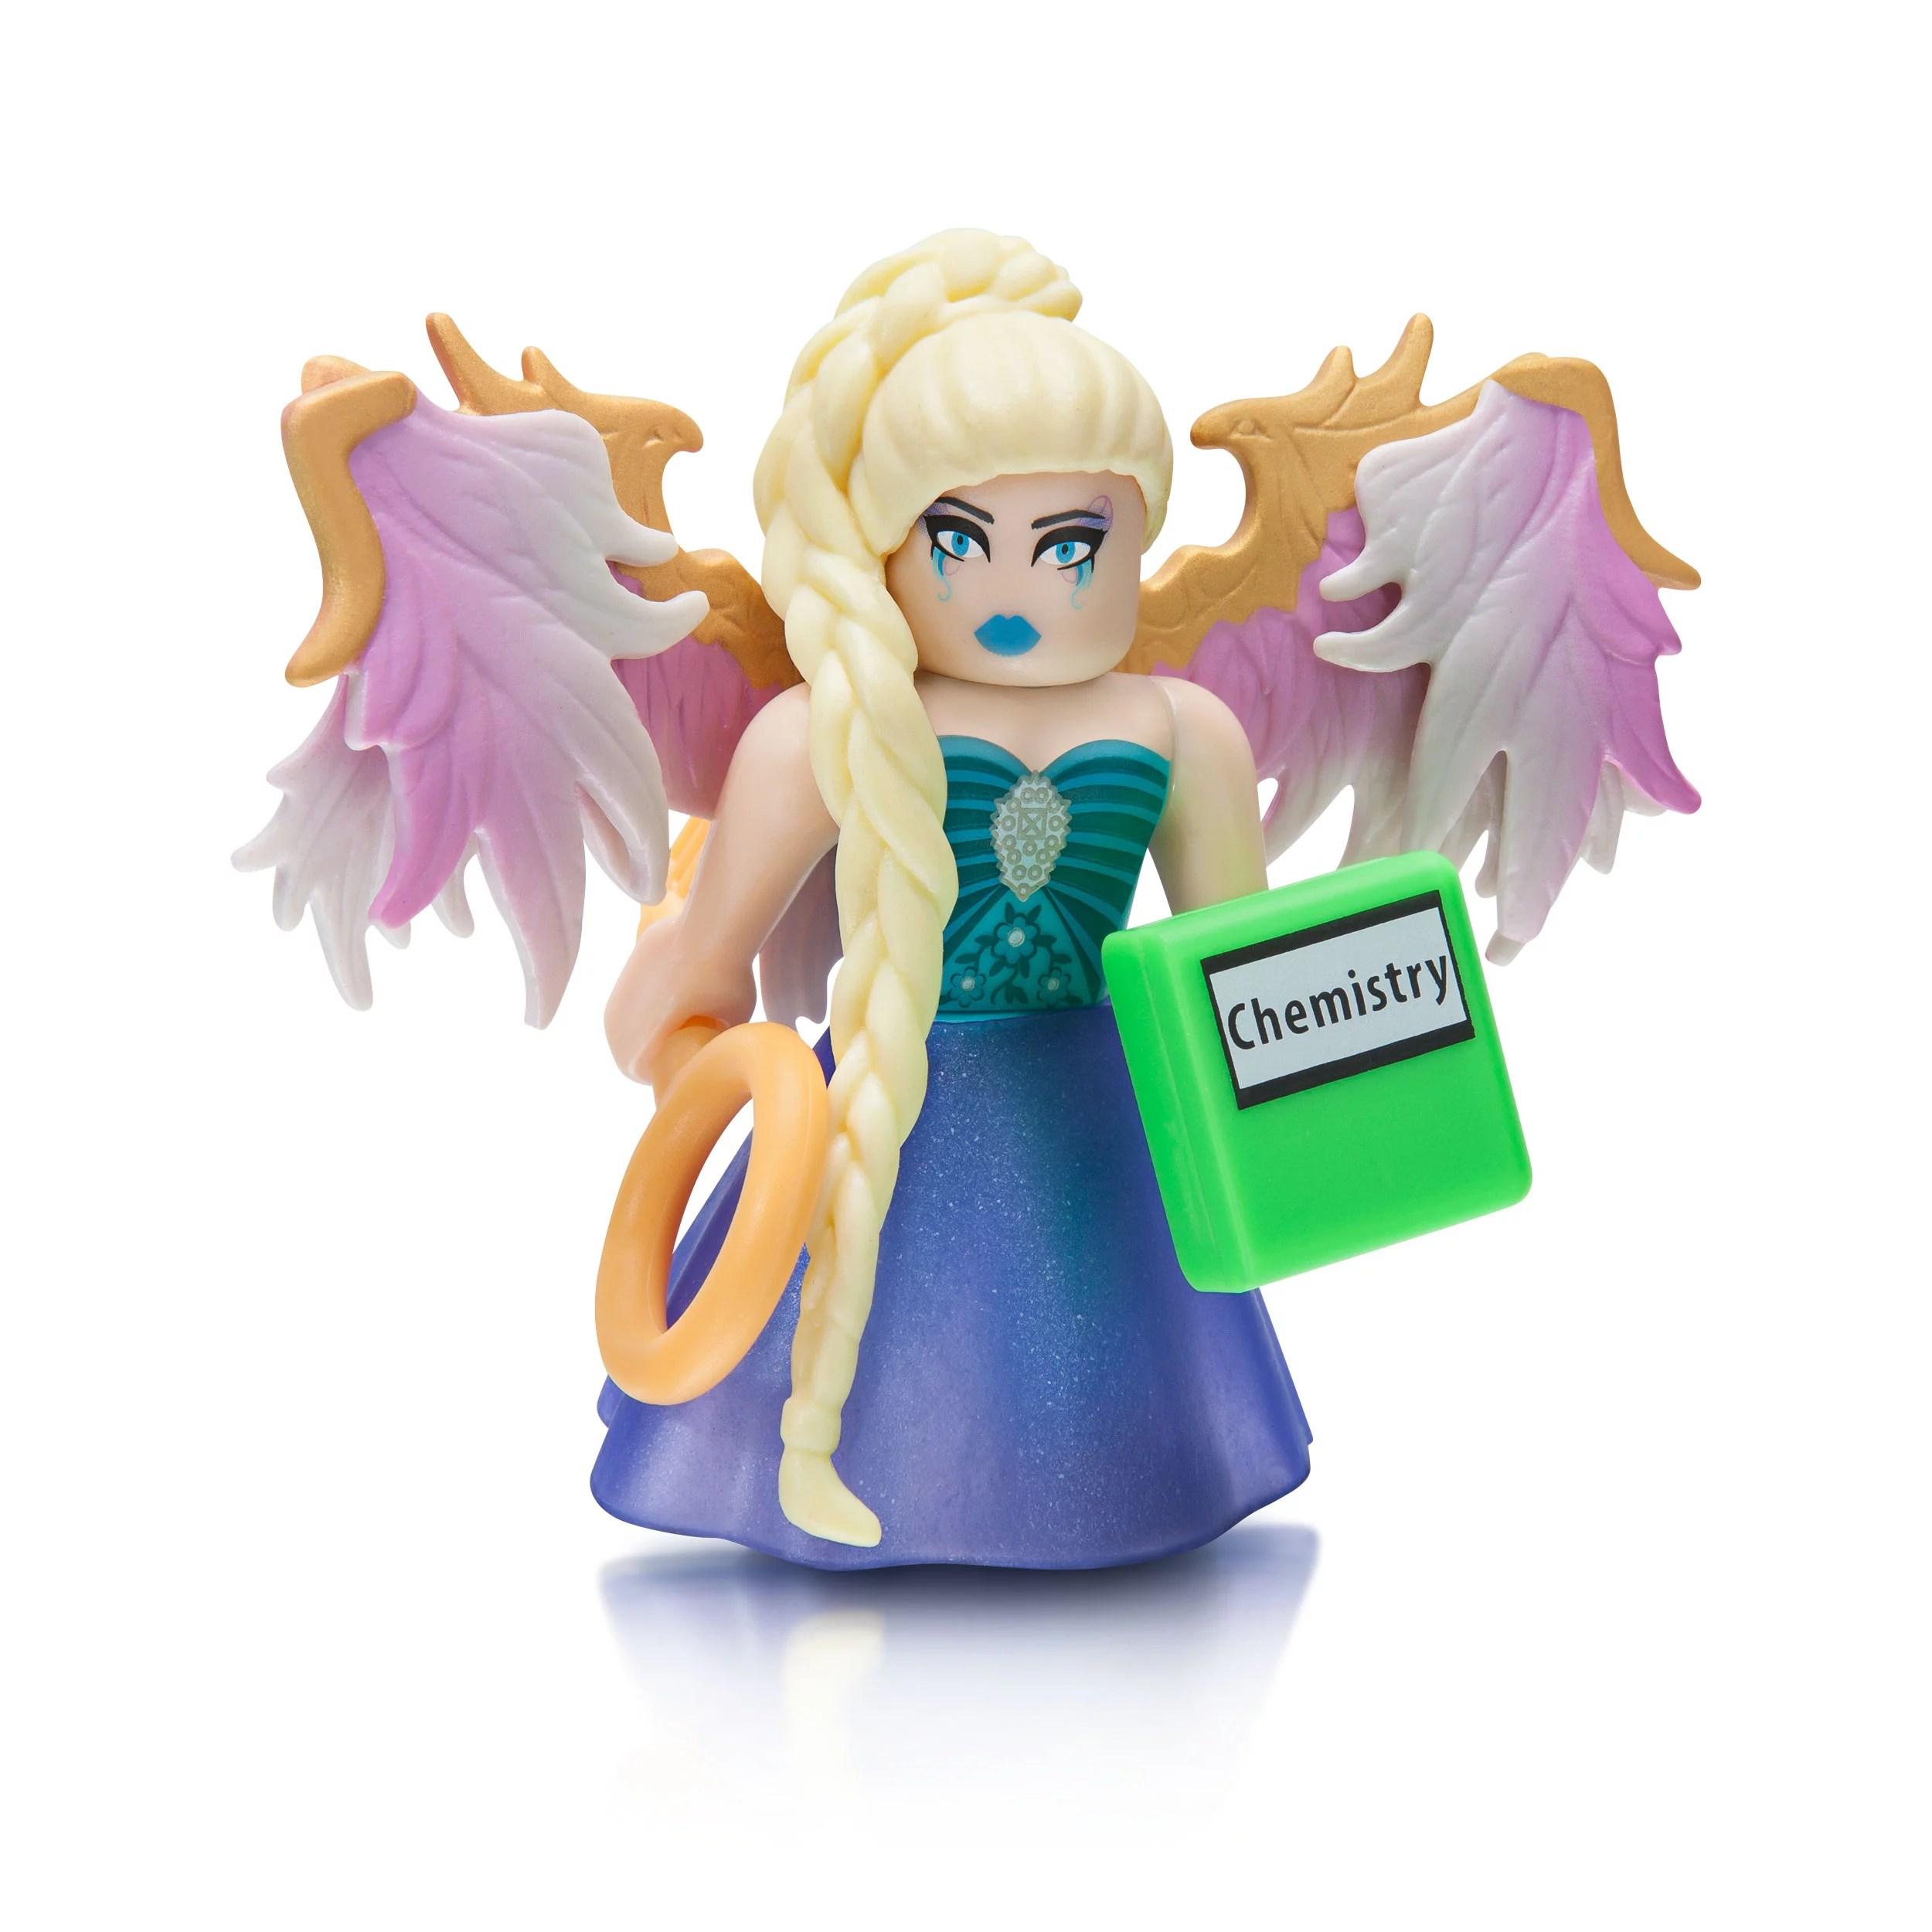 Roblox Celebrity Royale High School Enchantress Figure